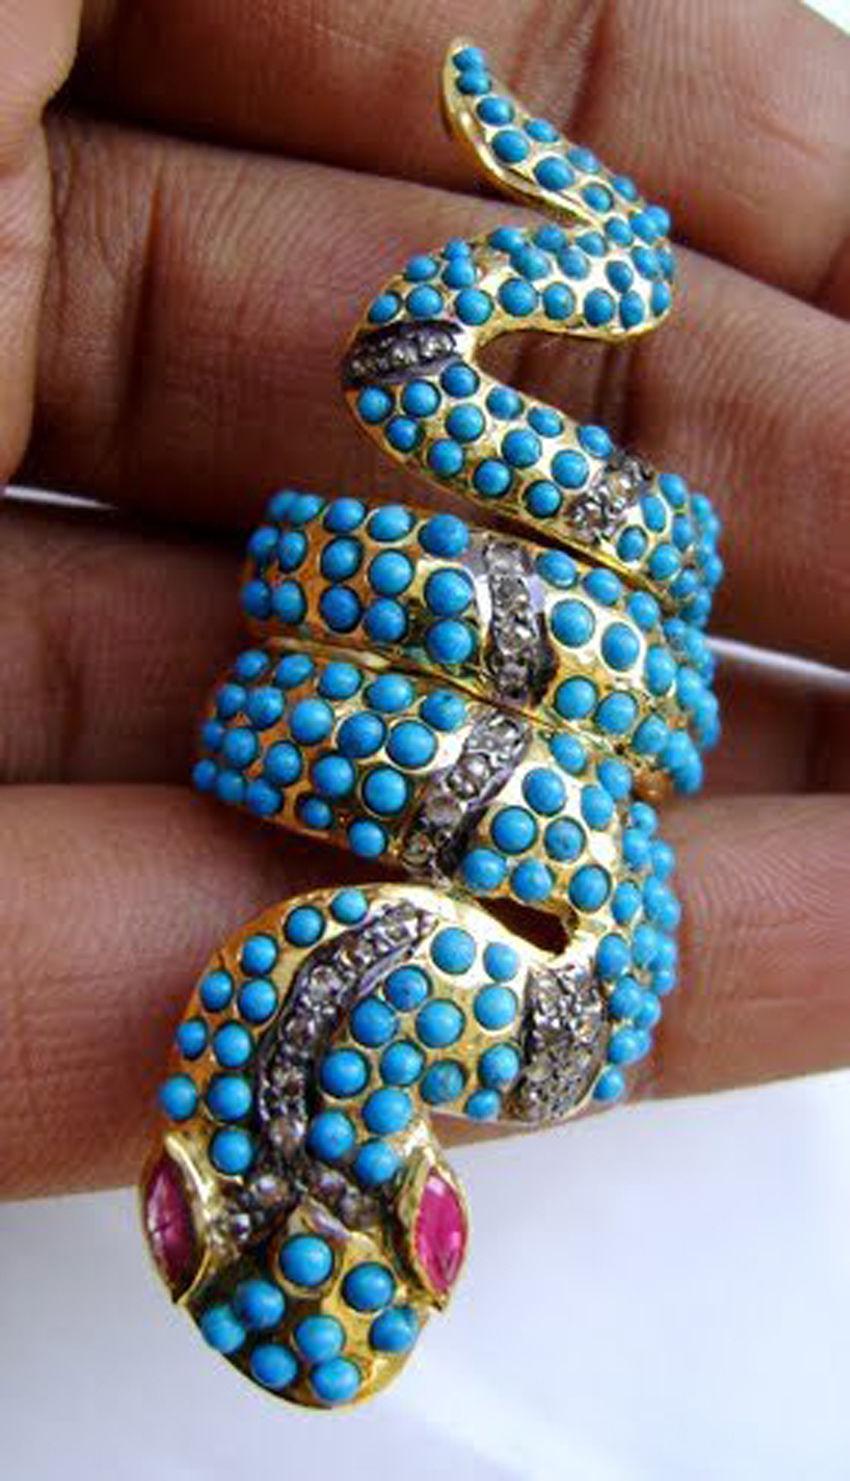 Vintage/Antique Repro. Rose Cut Diamond 925 Silver Turquoise  Ring @CSJUK579